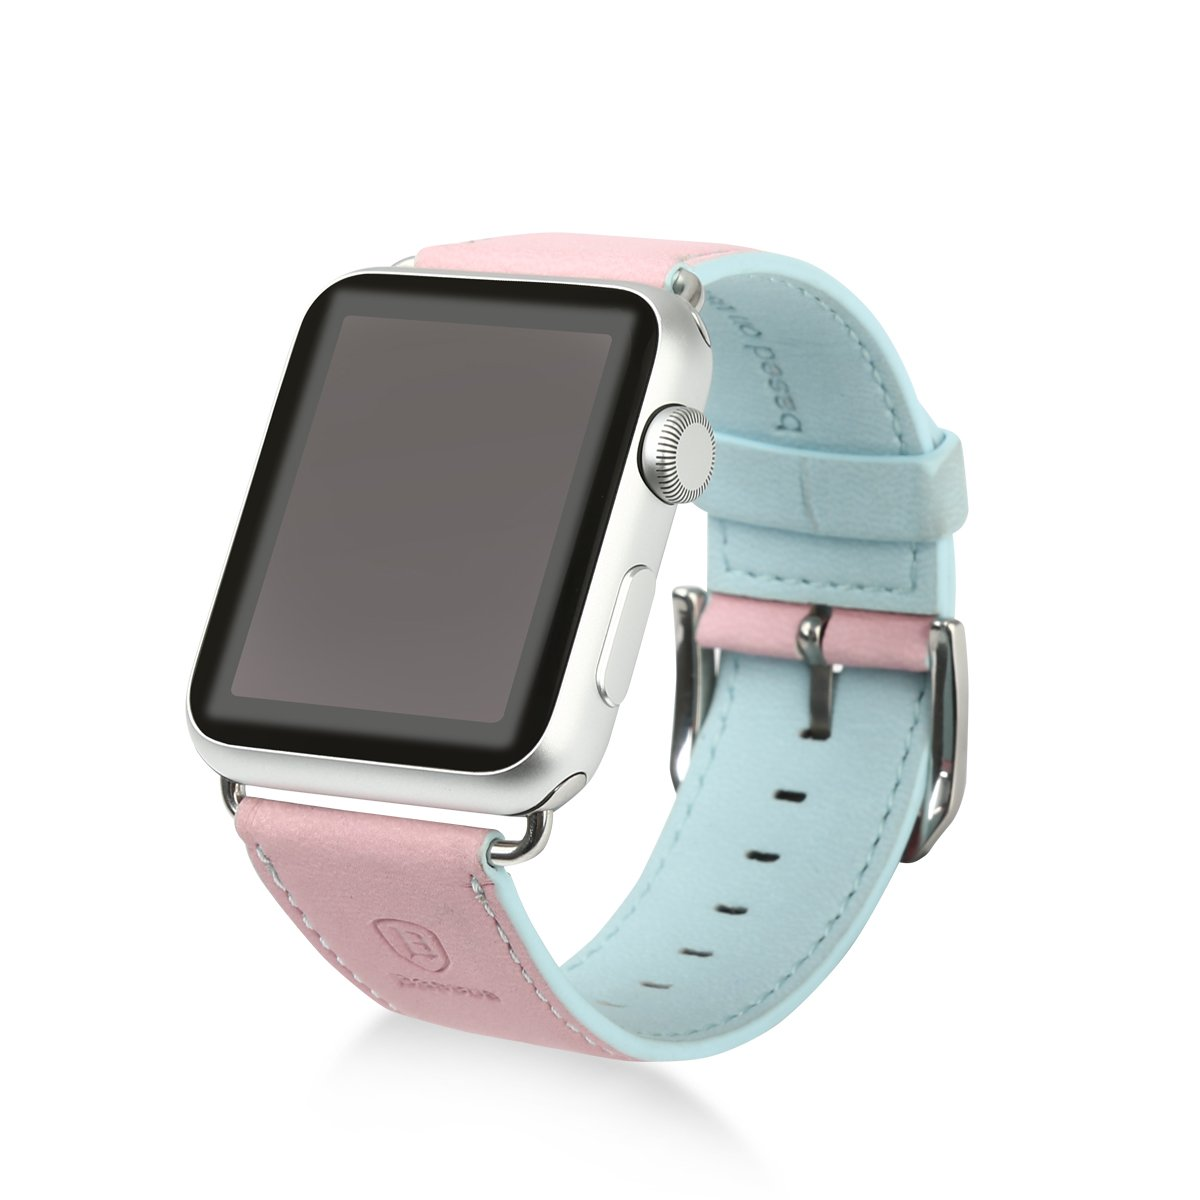 baseus 倍思 苹果watch手表表带 38mm 法式马卡龙色系